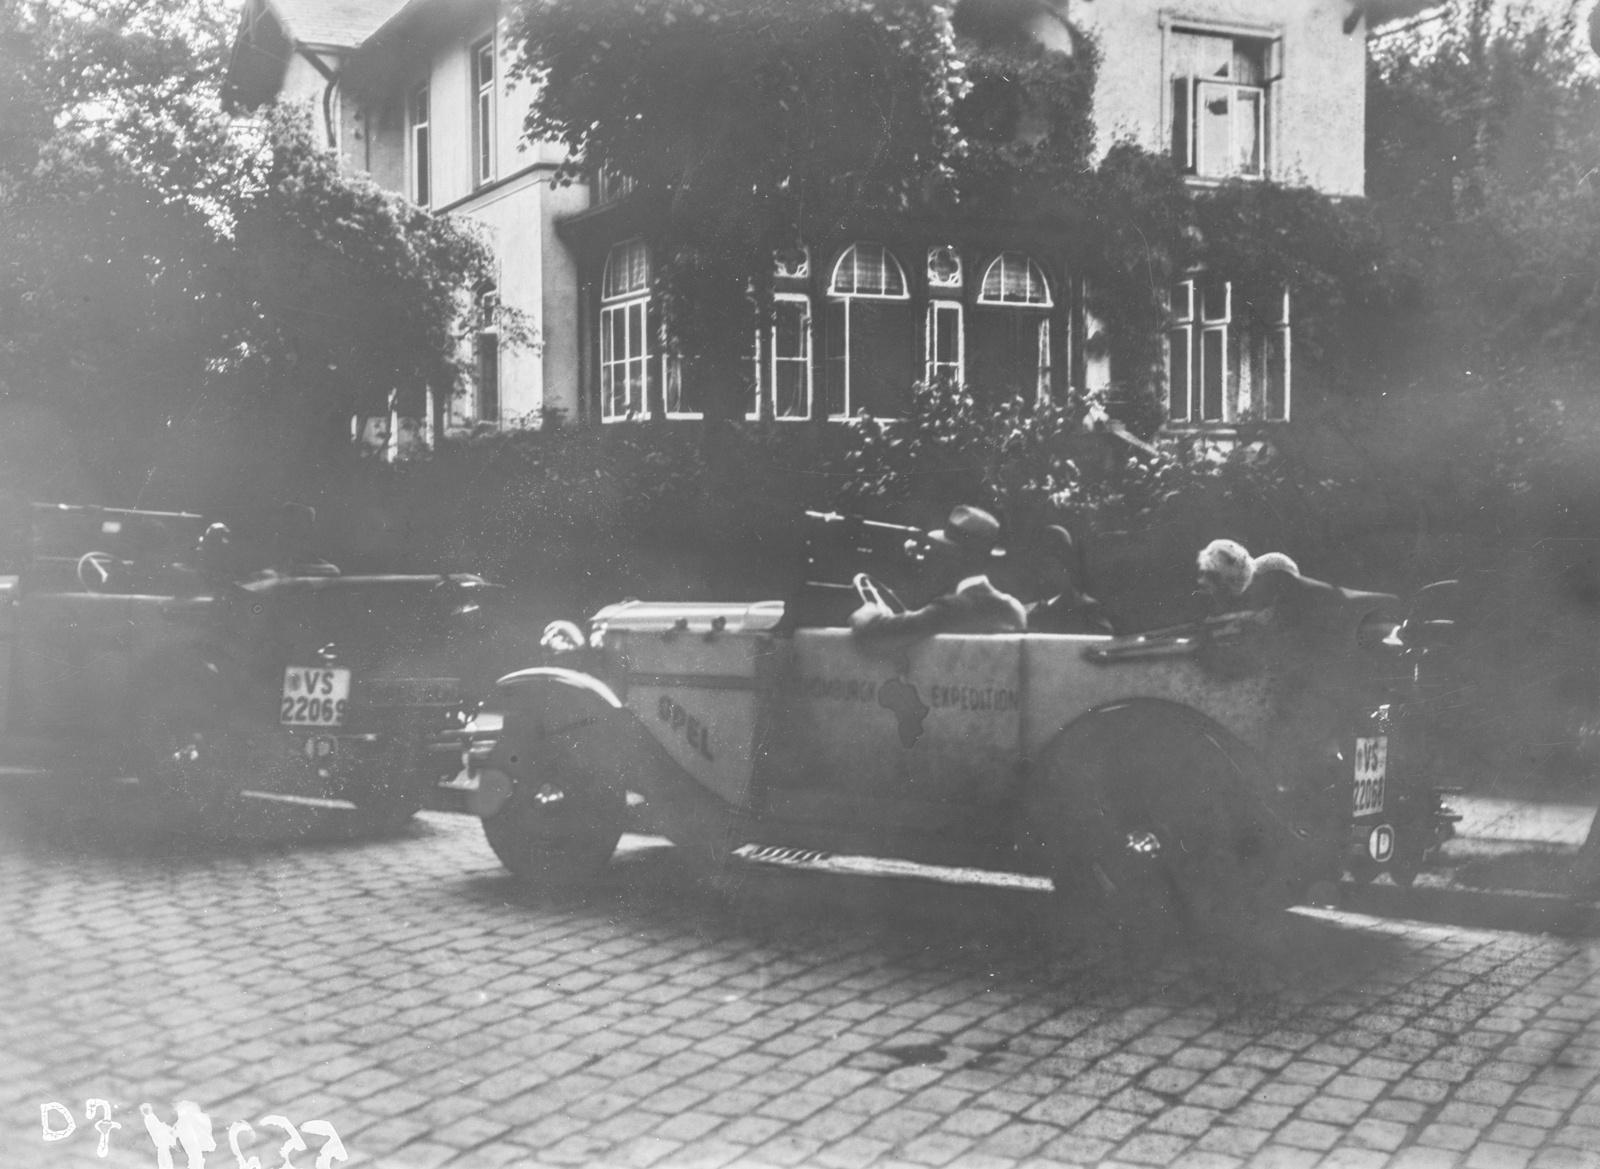 Гамбург. Два автомобиля экспедиции перед домом